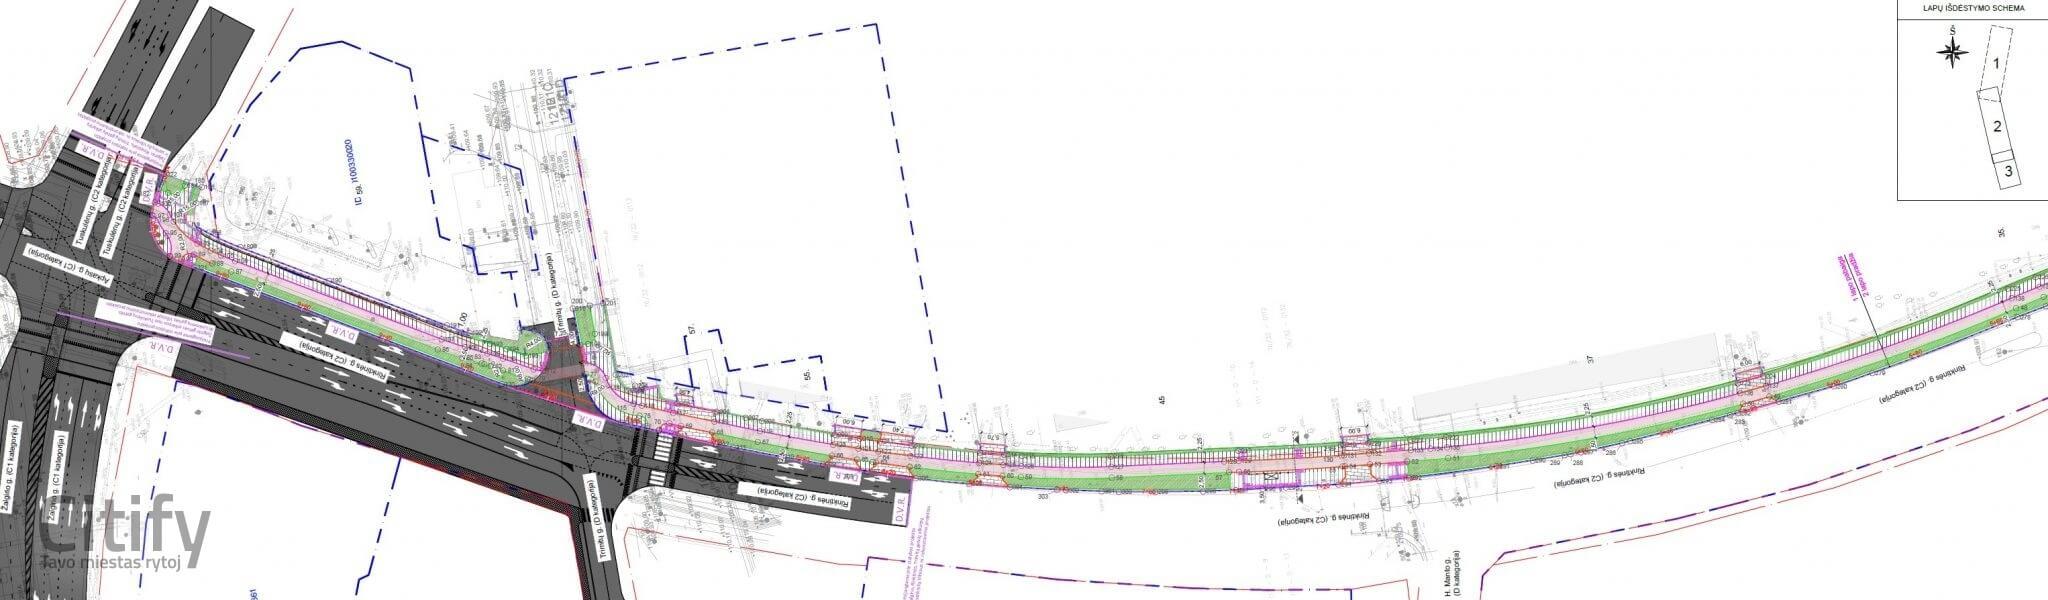 Citify-Rinktines-g.-dviraciu-takas-03.jpg (2048×600)